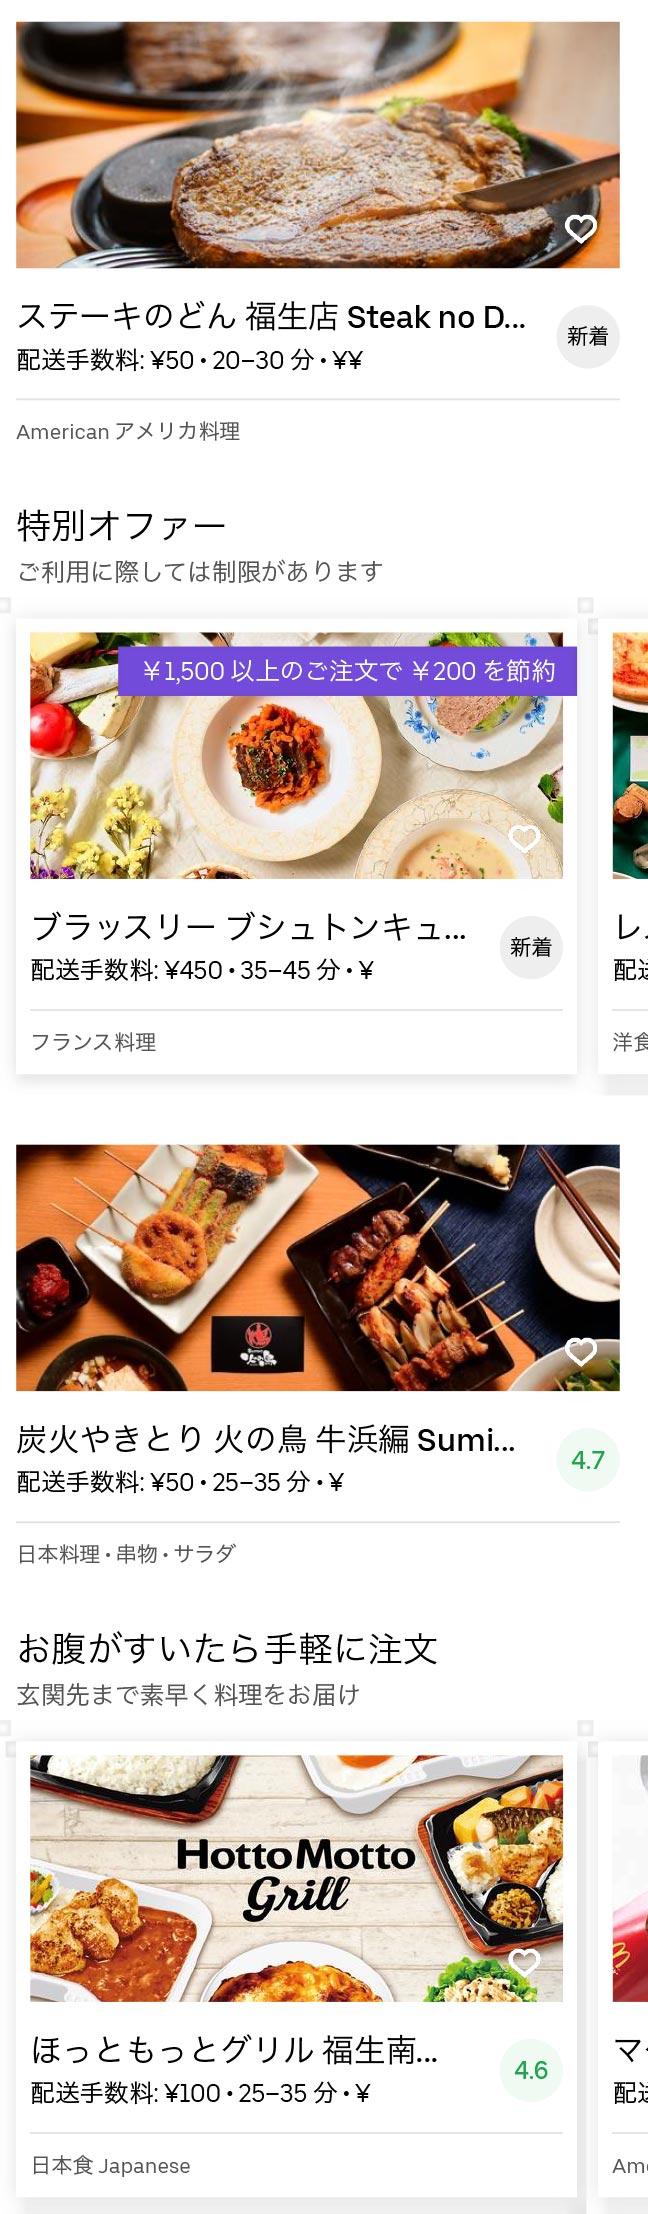 Fussa menu 2004 01